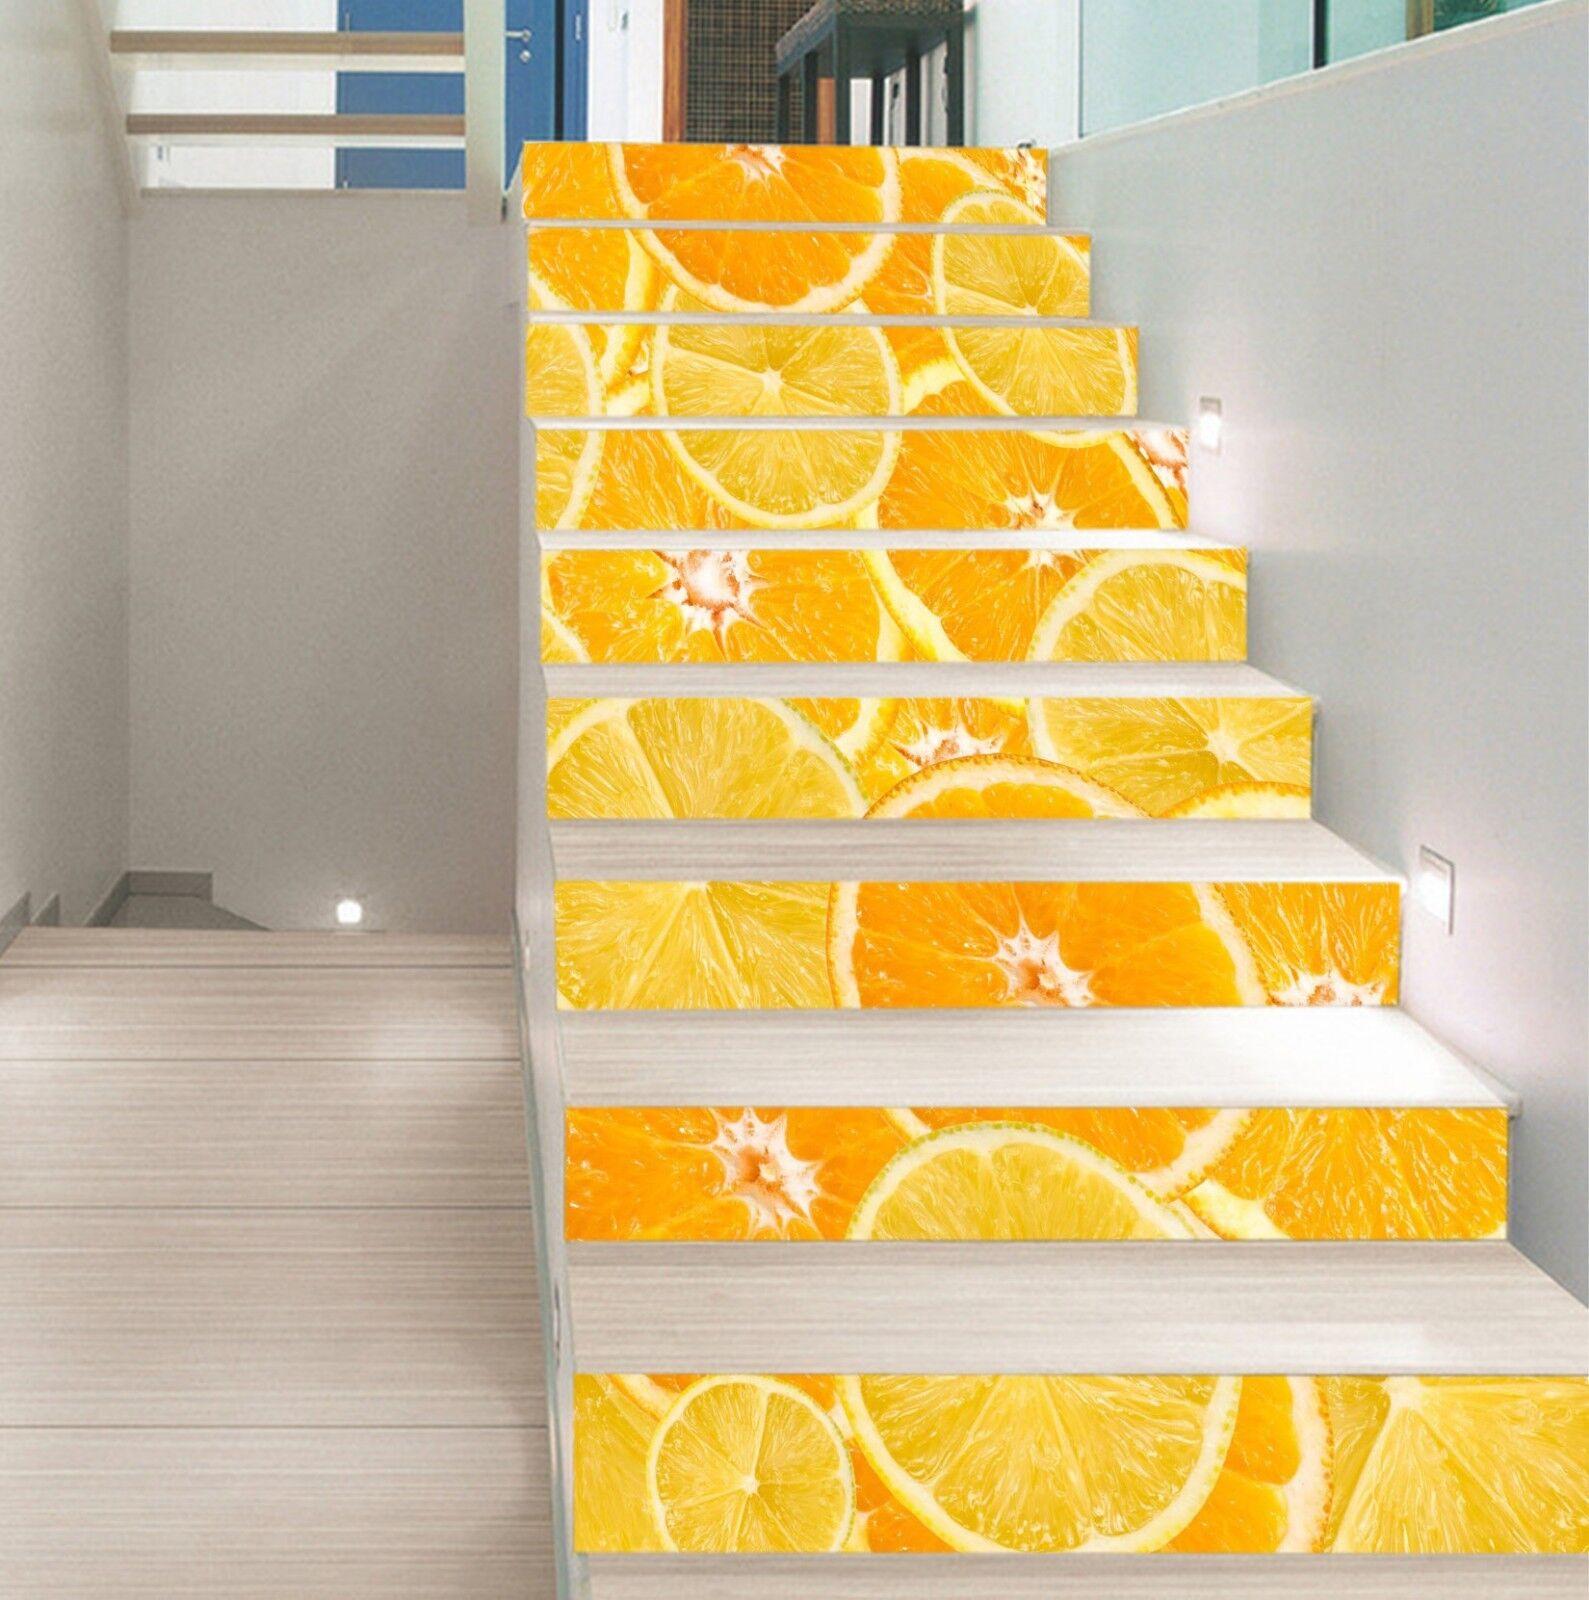 3D jaune Lemon Stair Risers Decoration Photo Mural Vinyl Decal Wallpaper CA